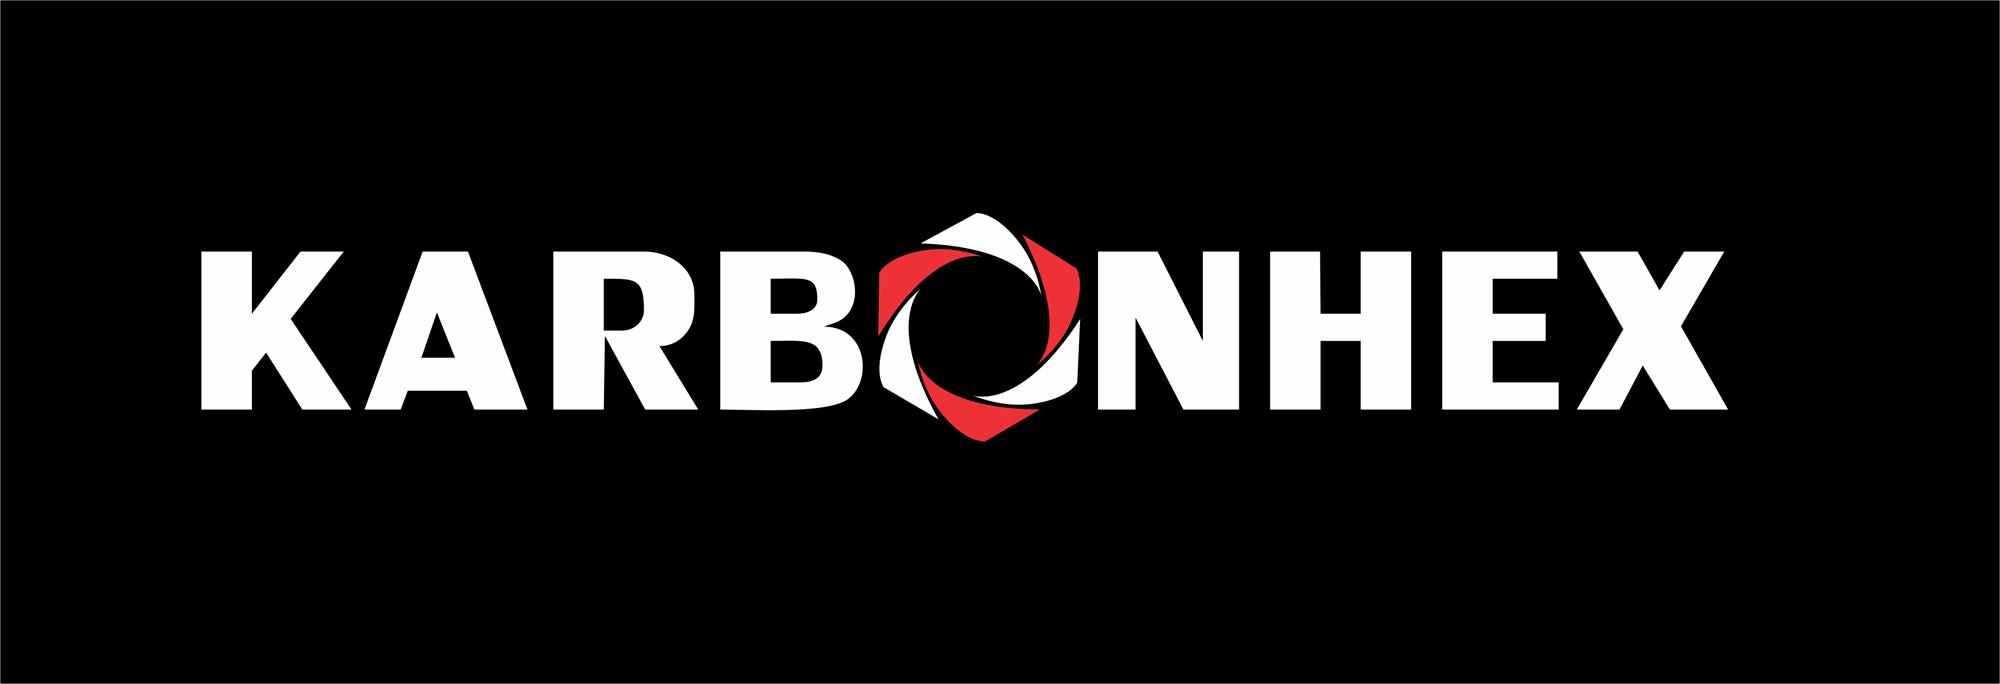 KARBONHEX Logo